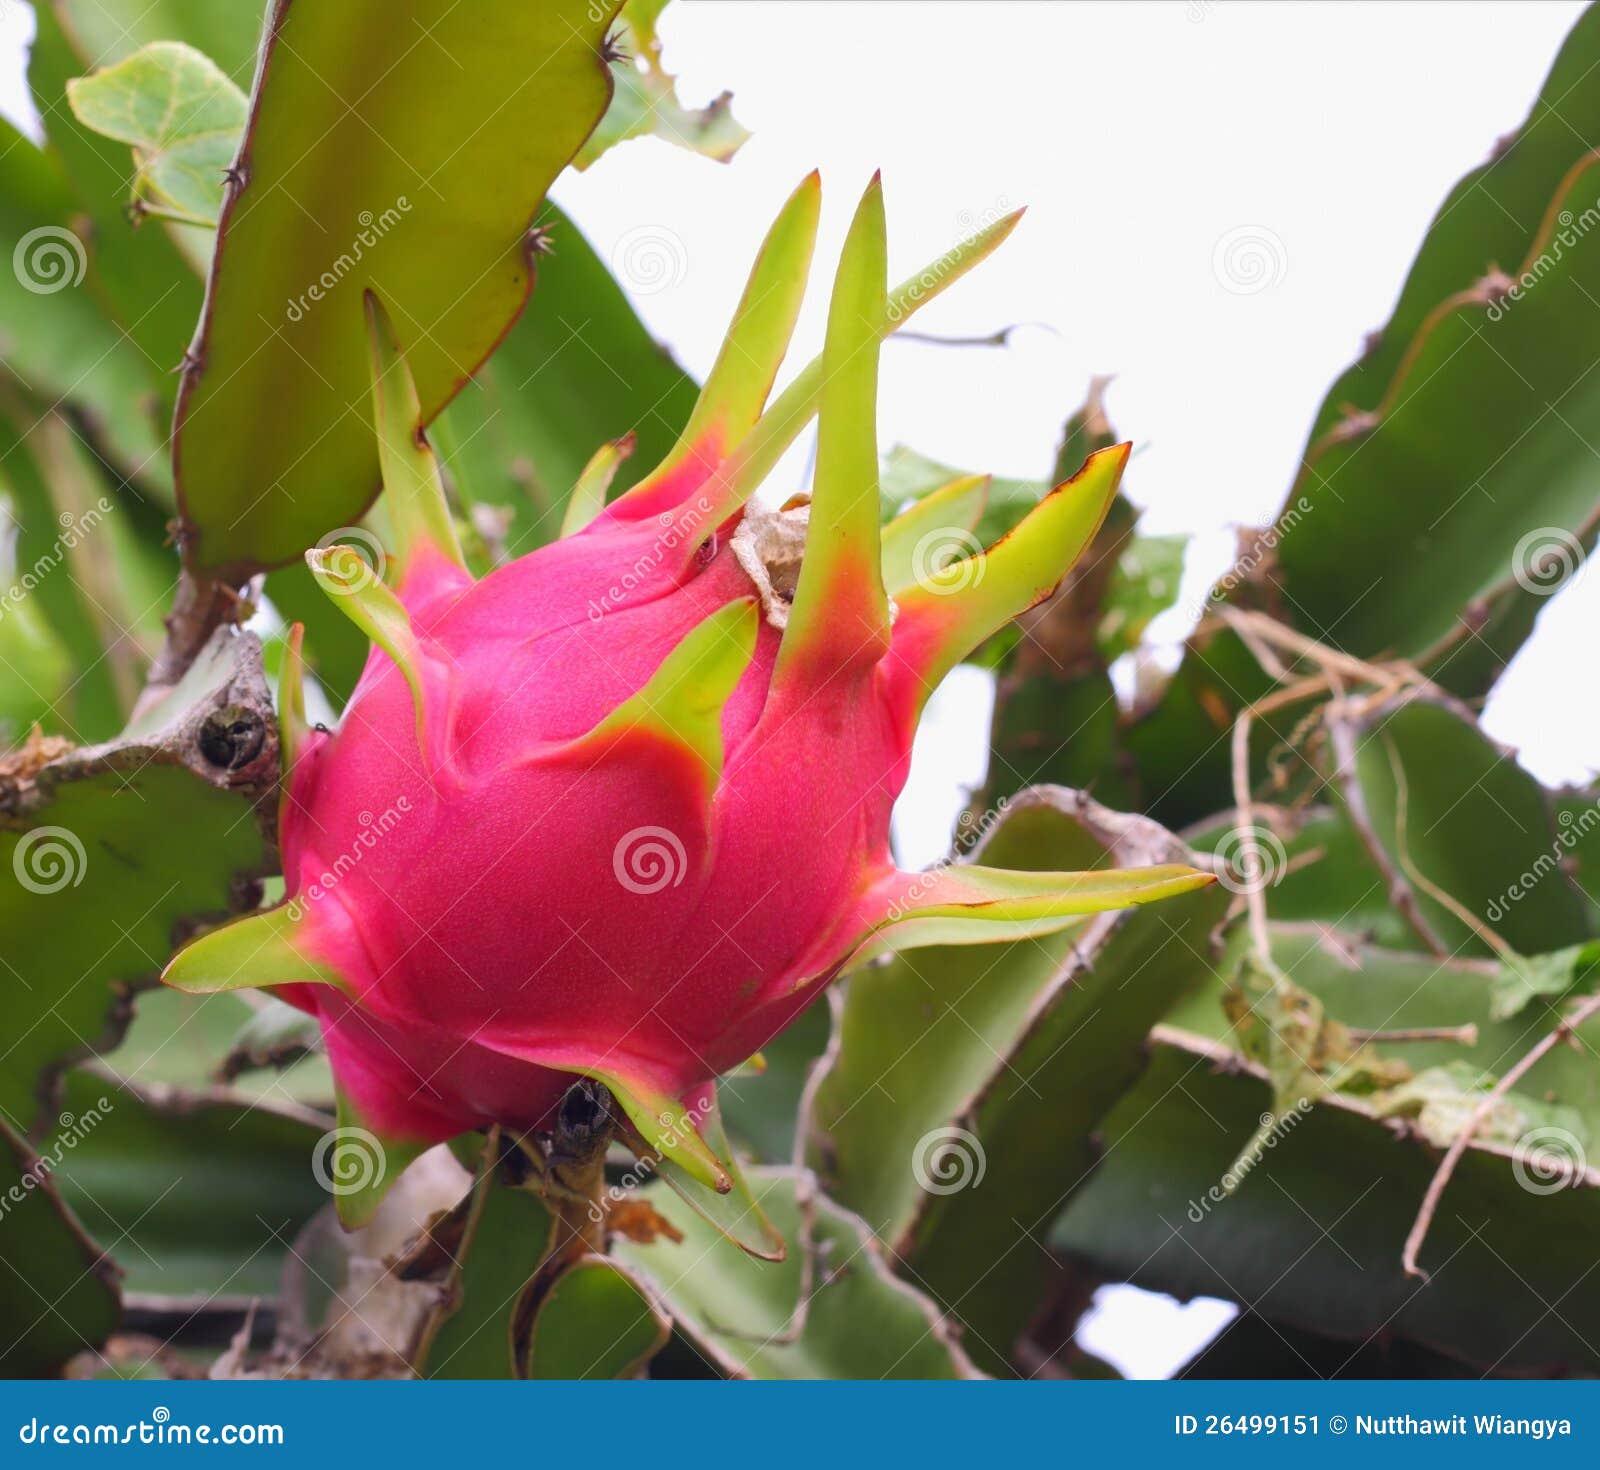 dragon fruit tree turbo fruits